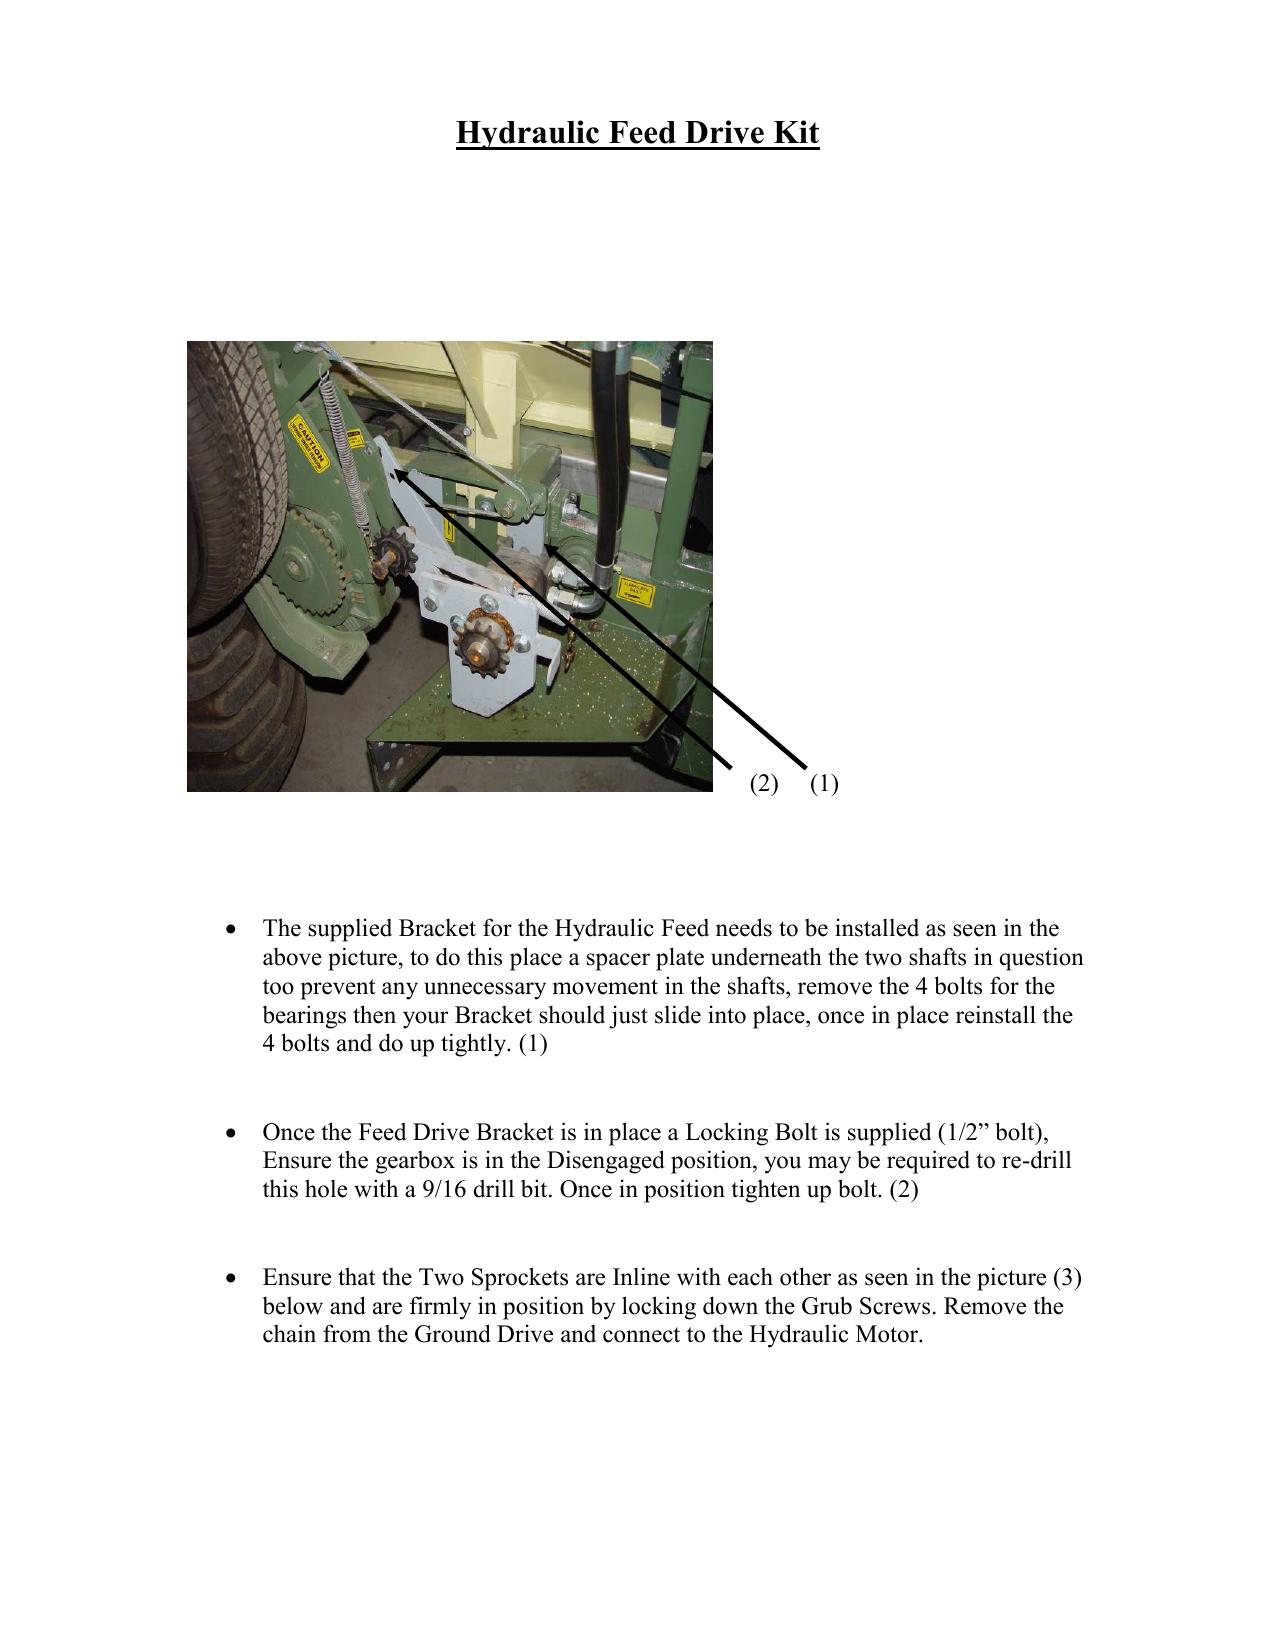 Hydraulic Feed Drive Kit   manualzz com